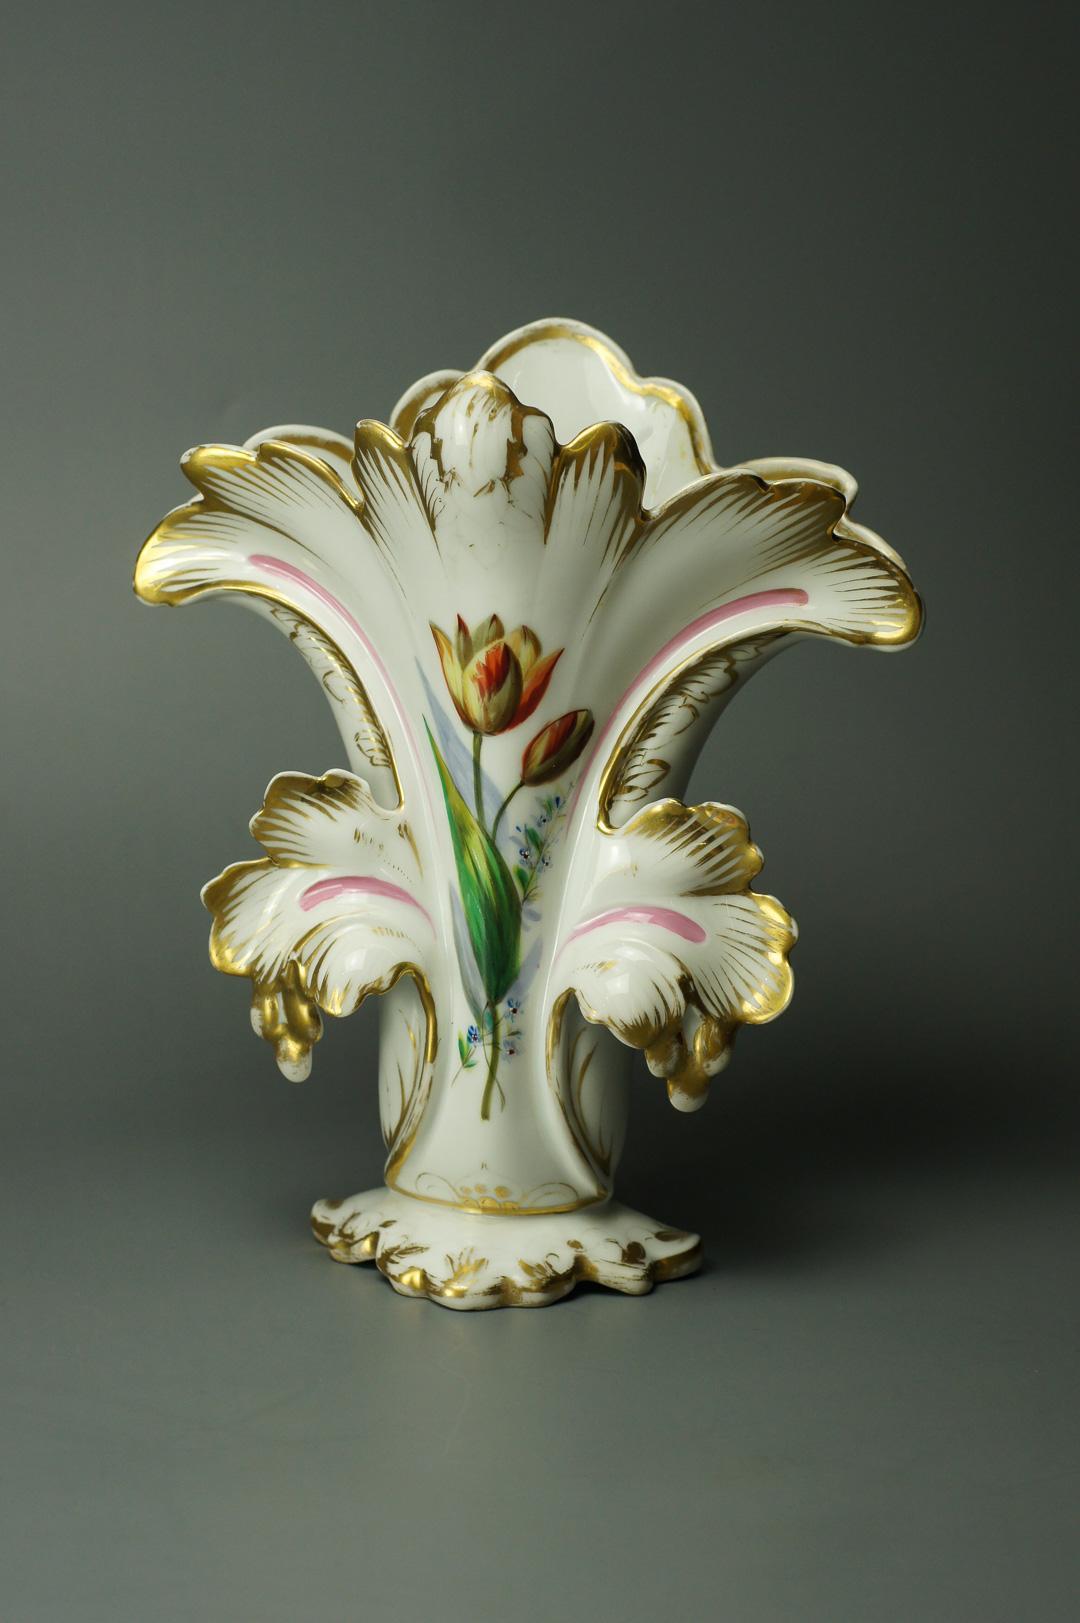 Ваза Тюльпаны фарфор Германия